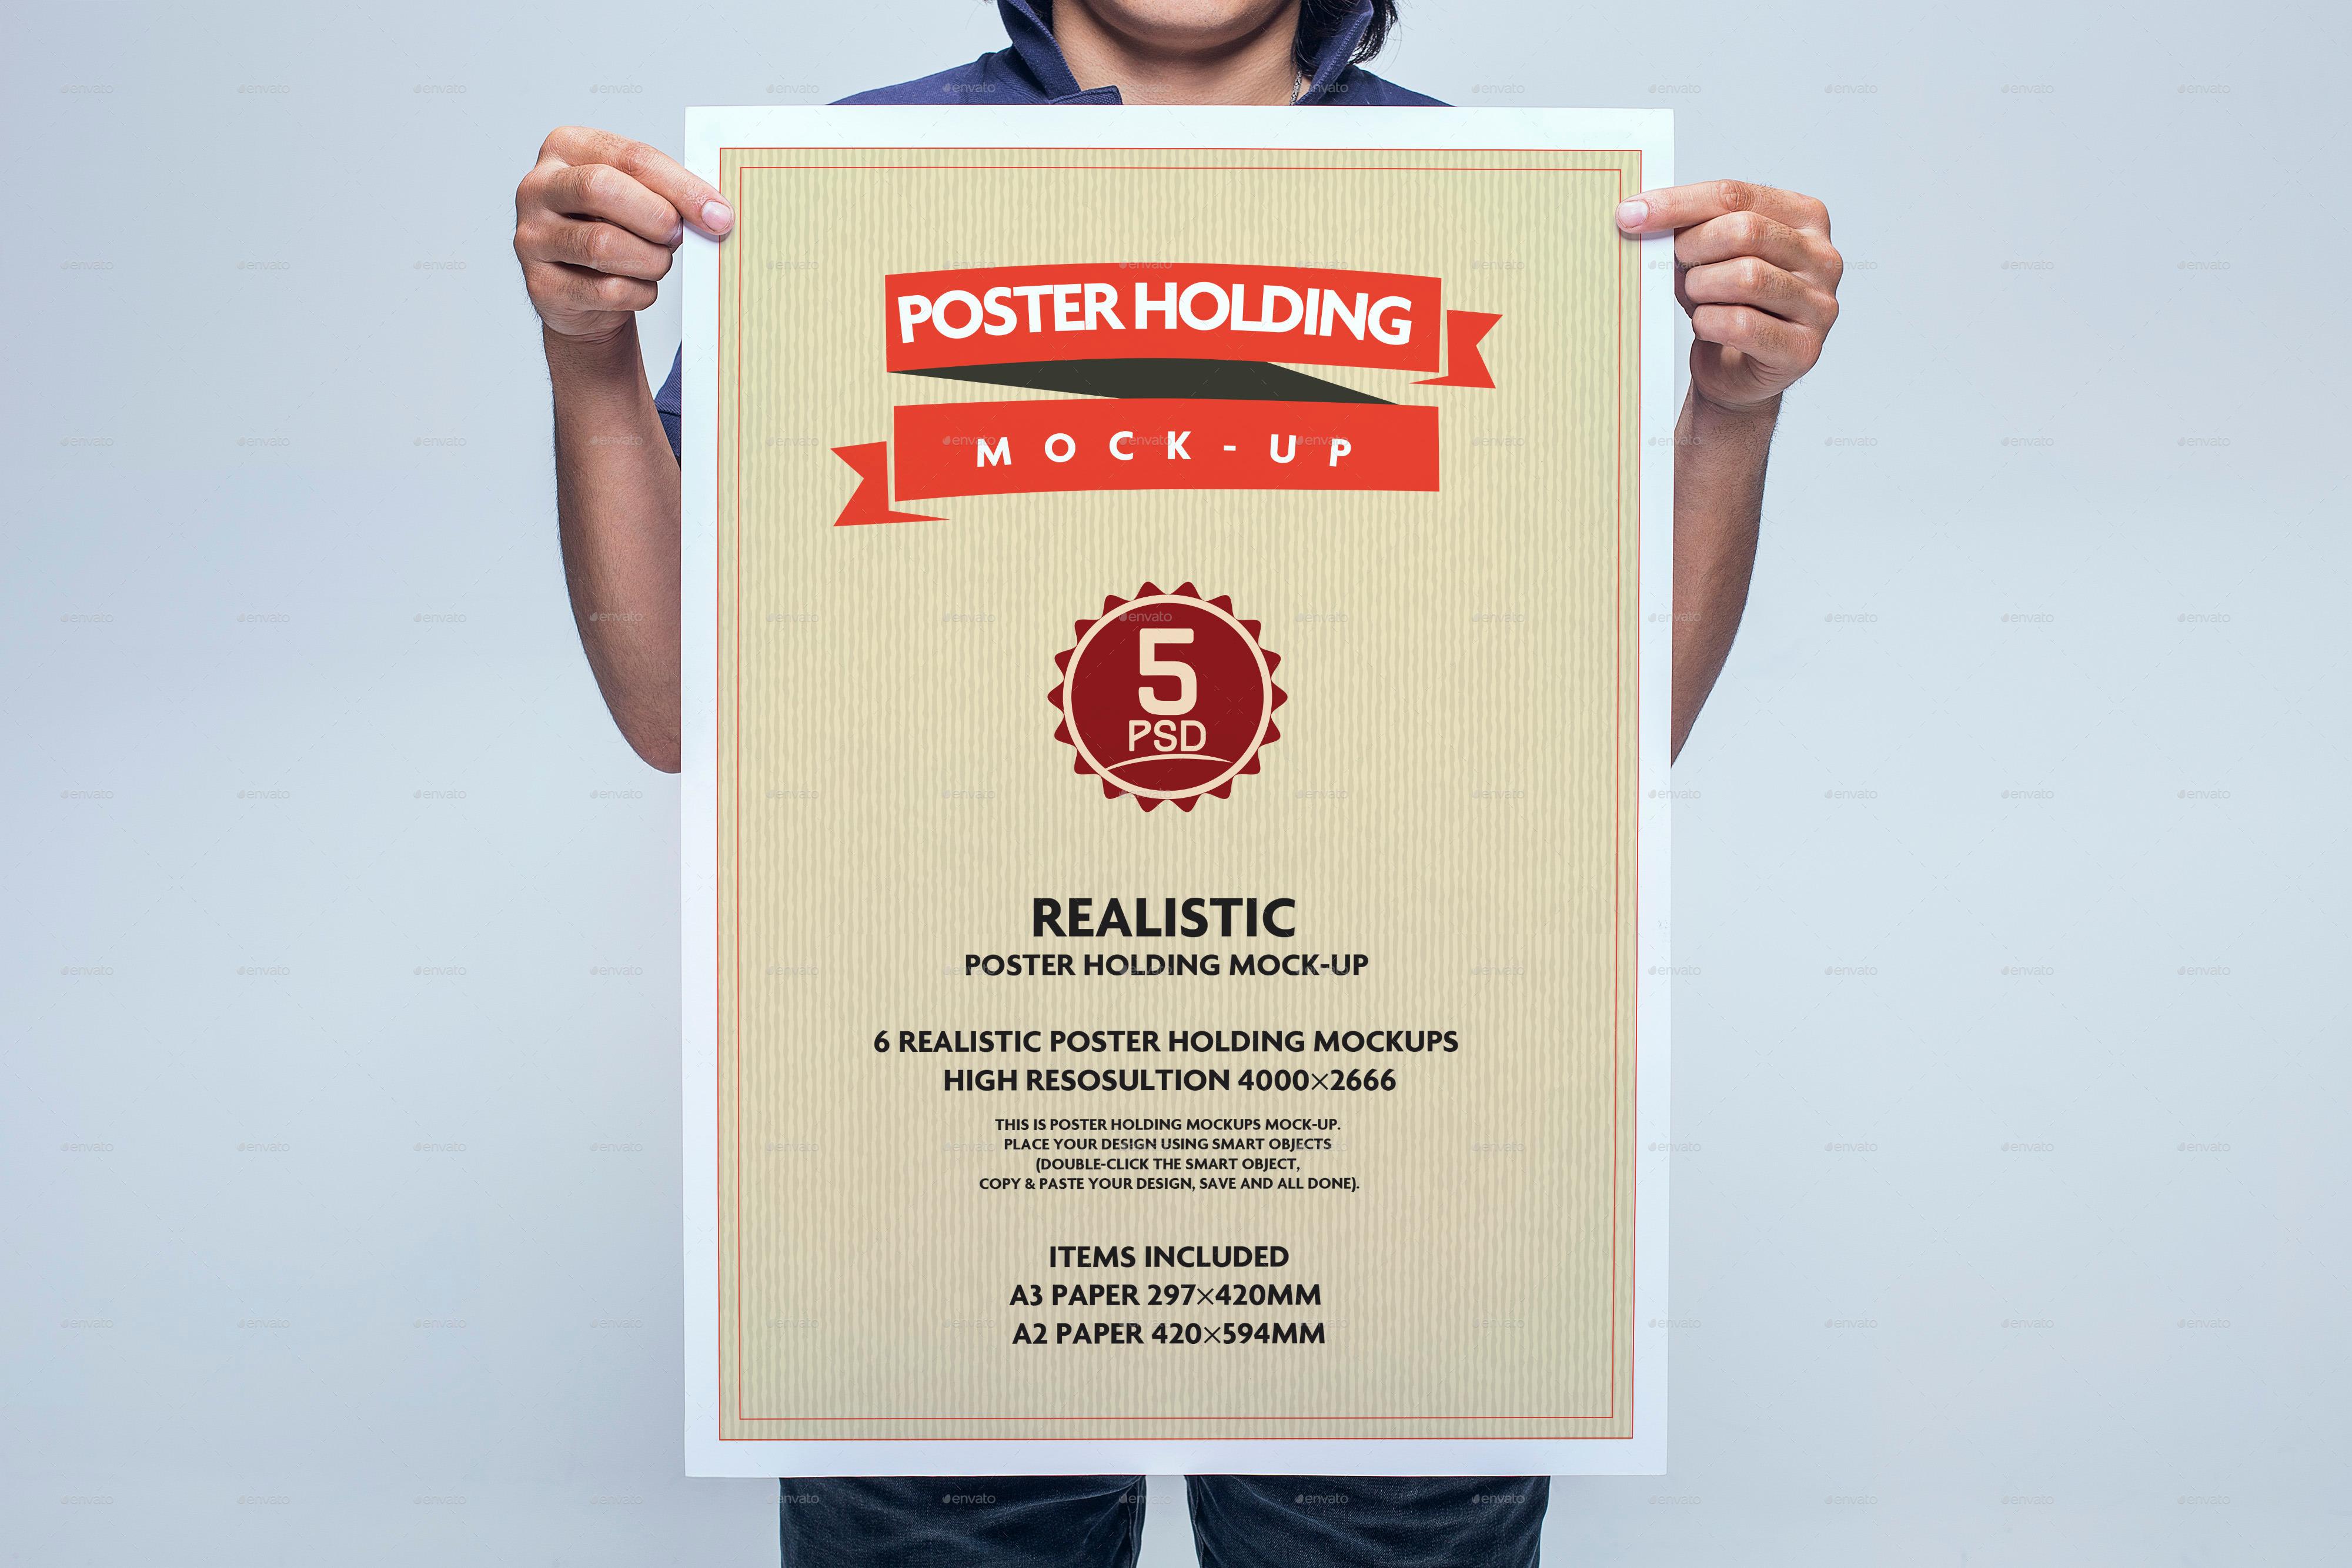 6 poster design photo mockups - Realistic Poster Holding Mock Up